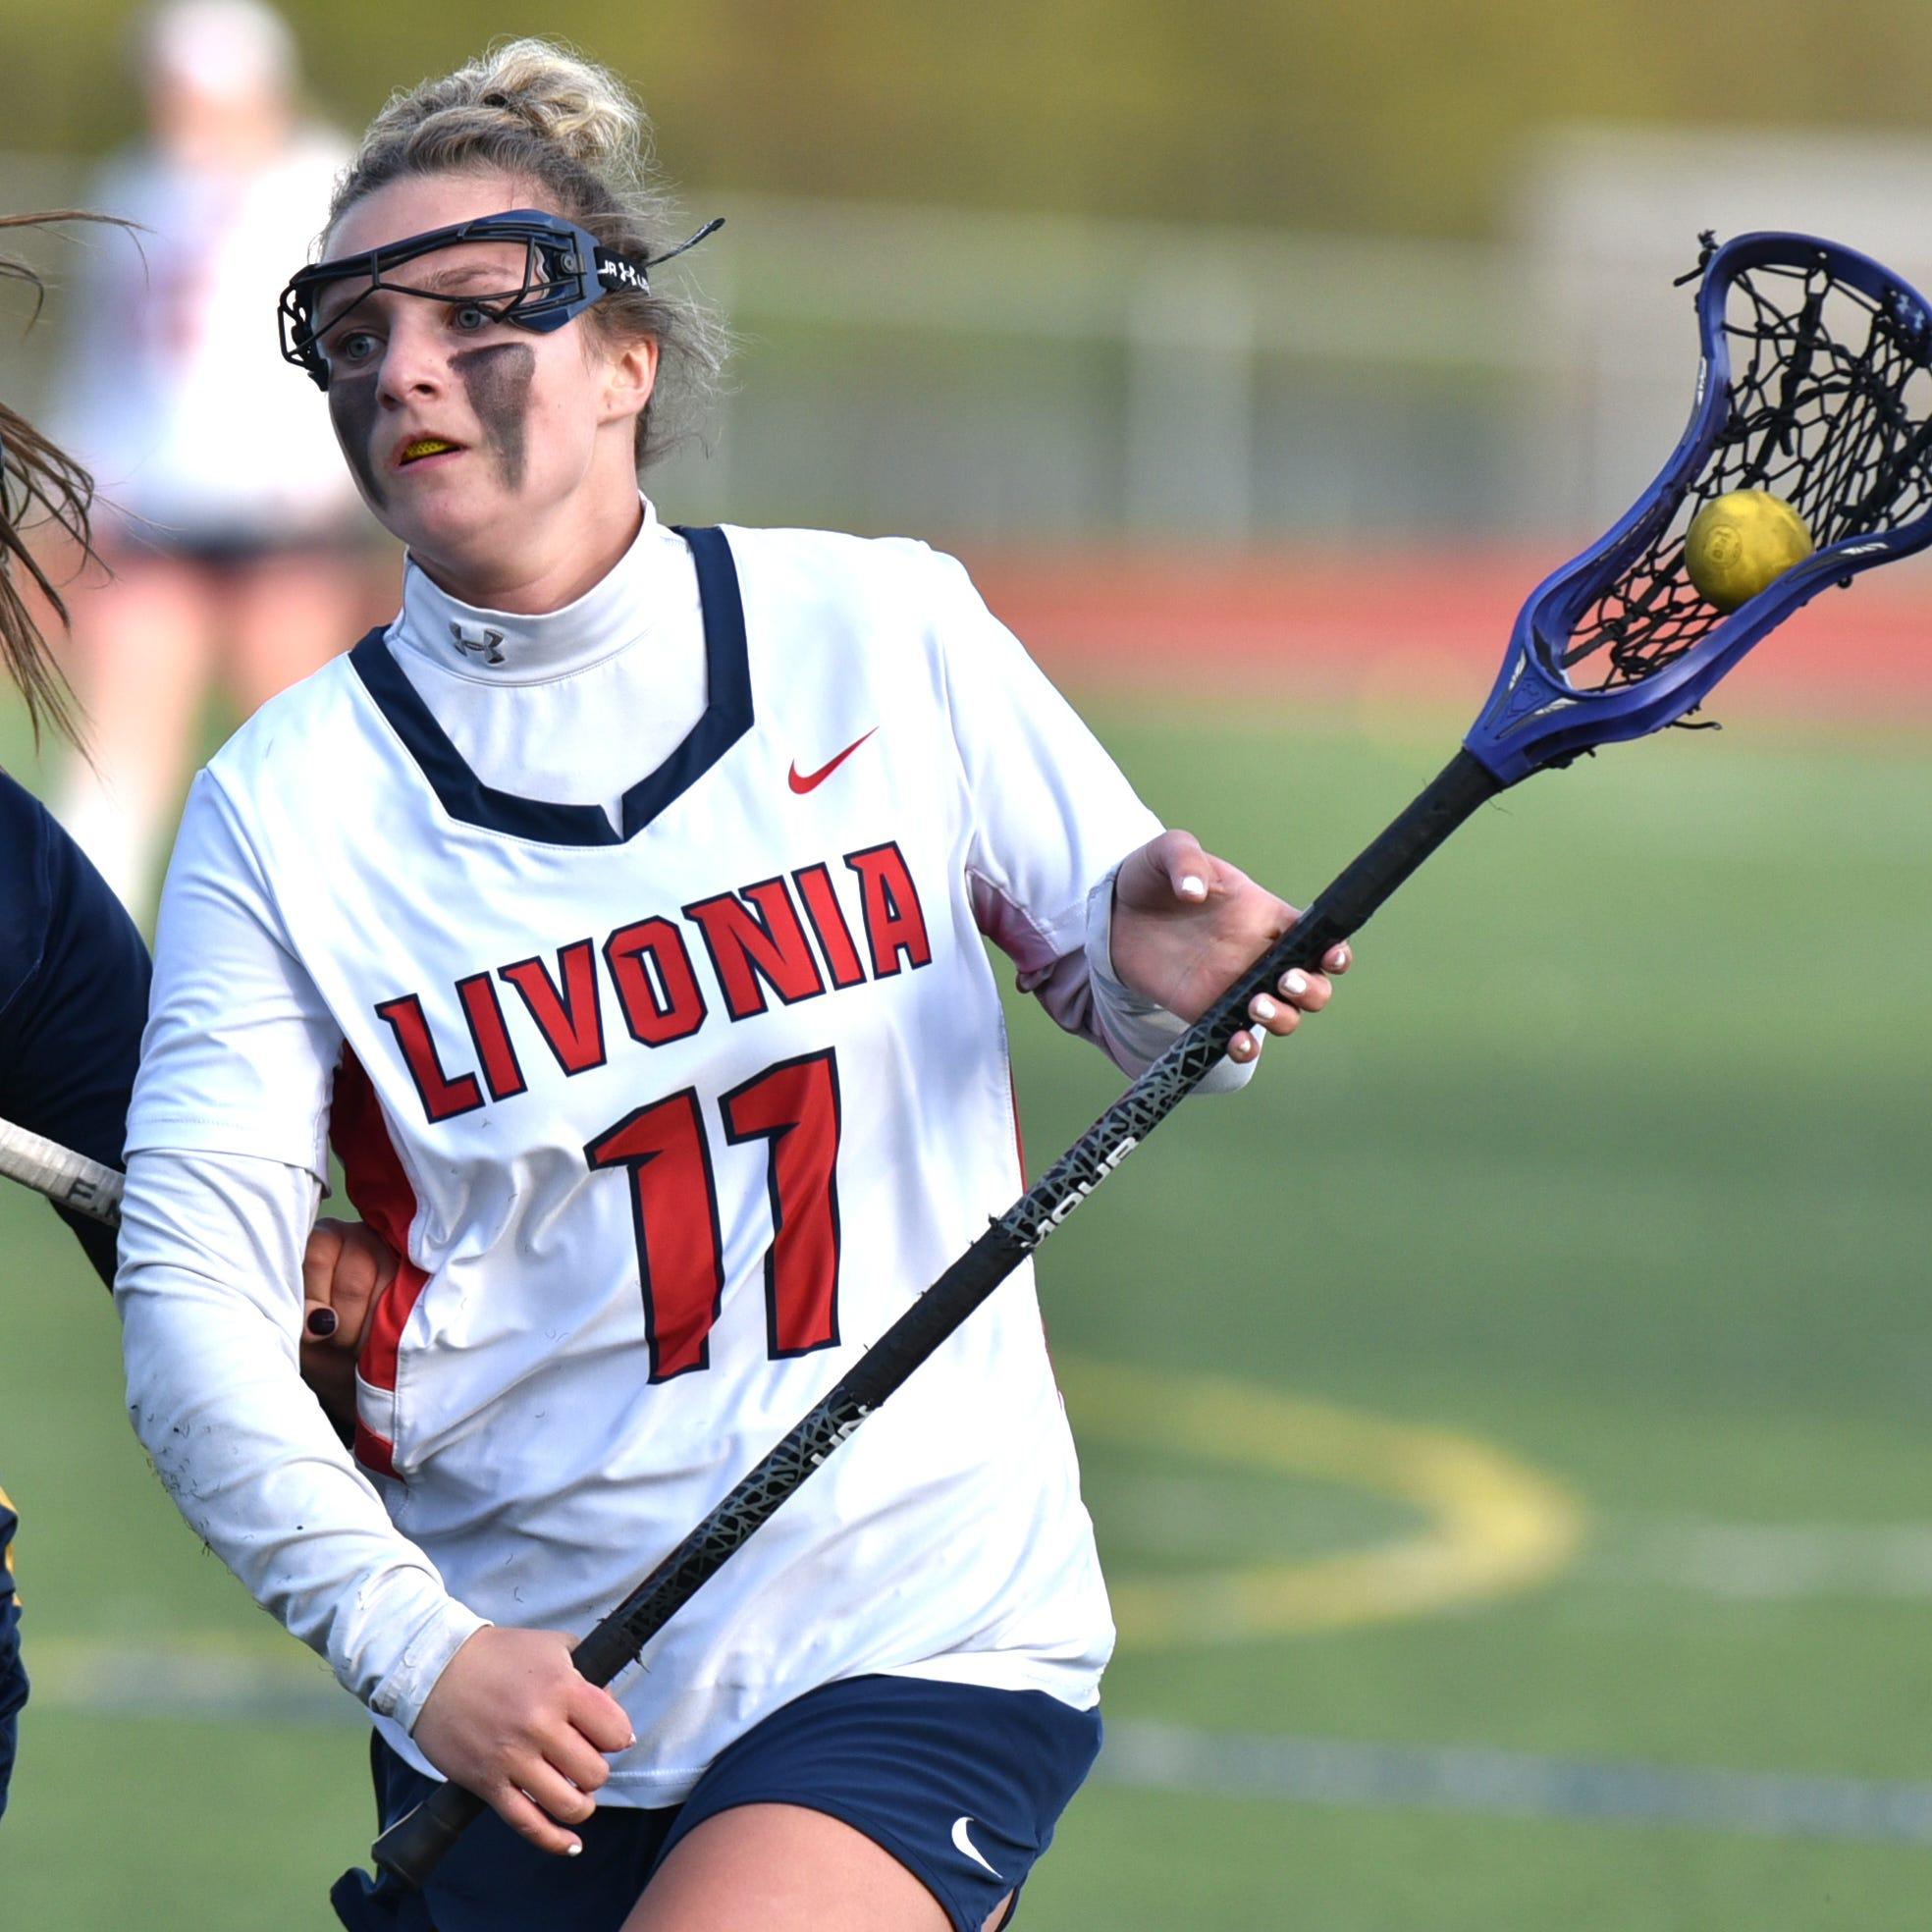 Hartland girls lacrosse dominates Livonia to win KLAA championship